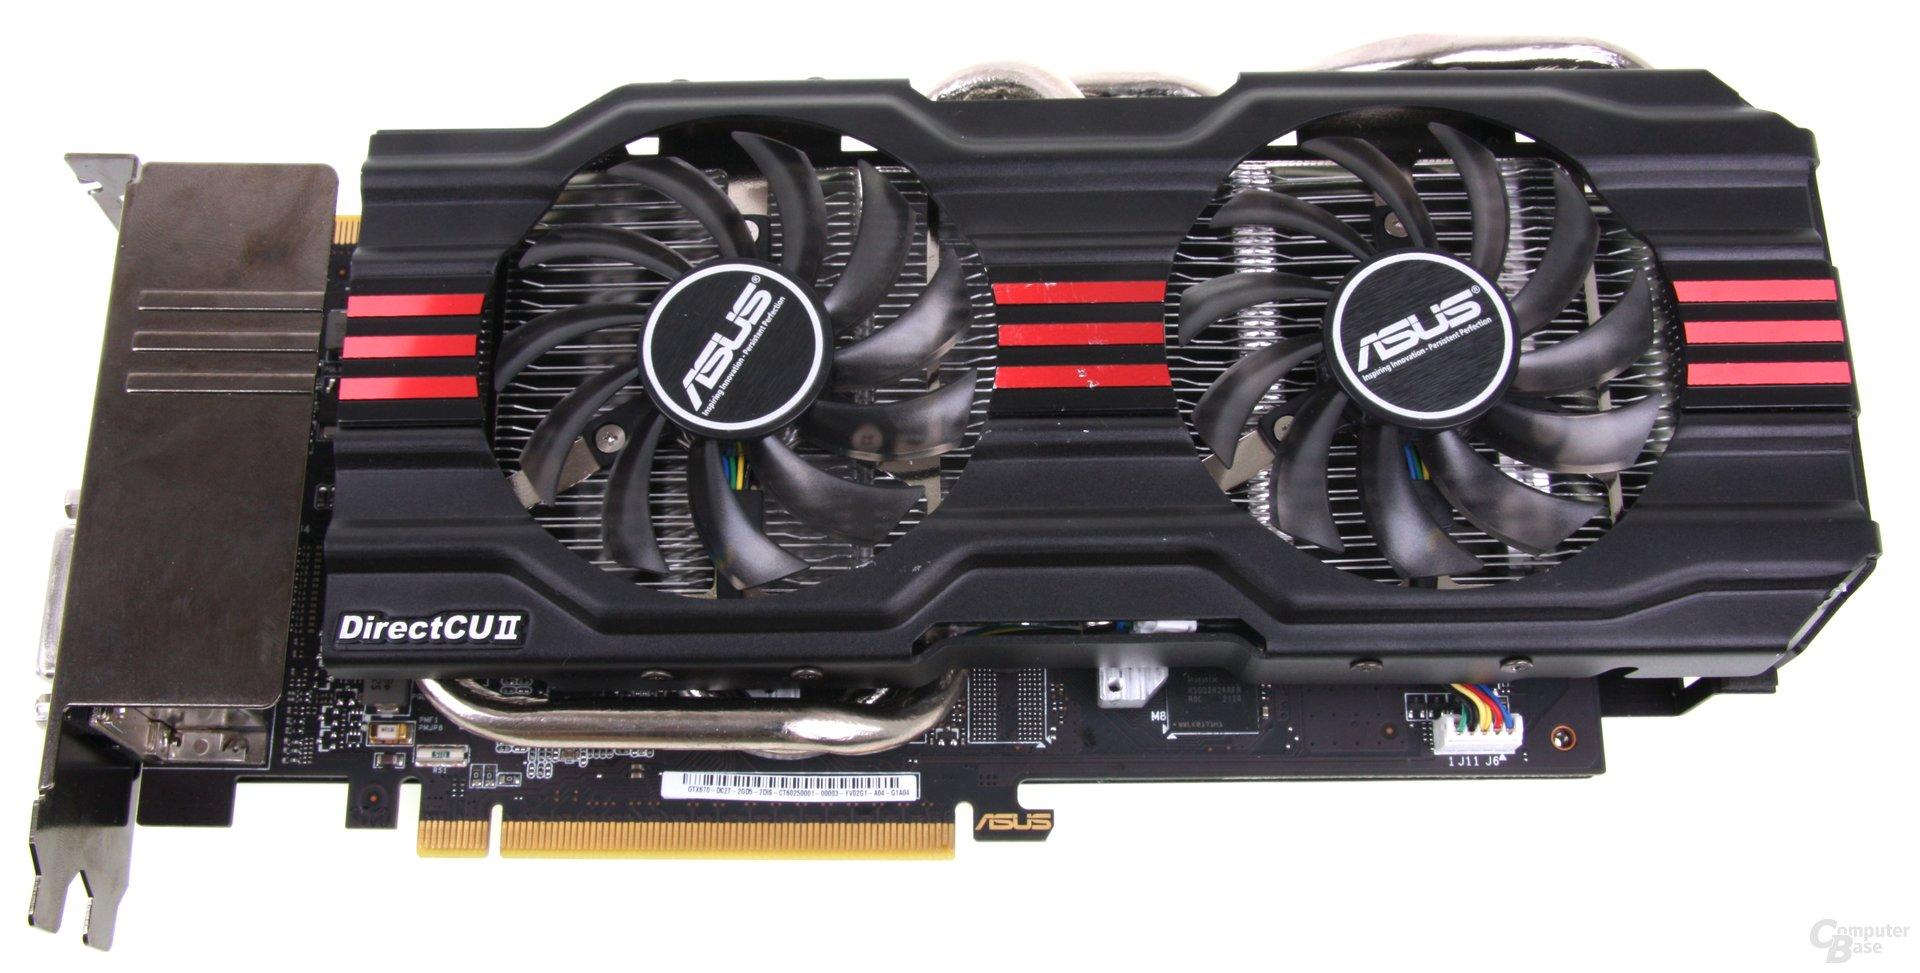 Asus GeForce GTX 670 DCII OC